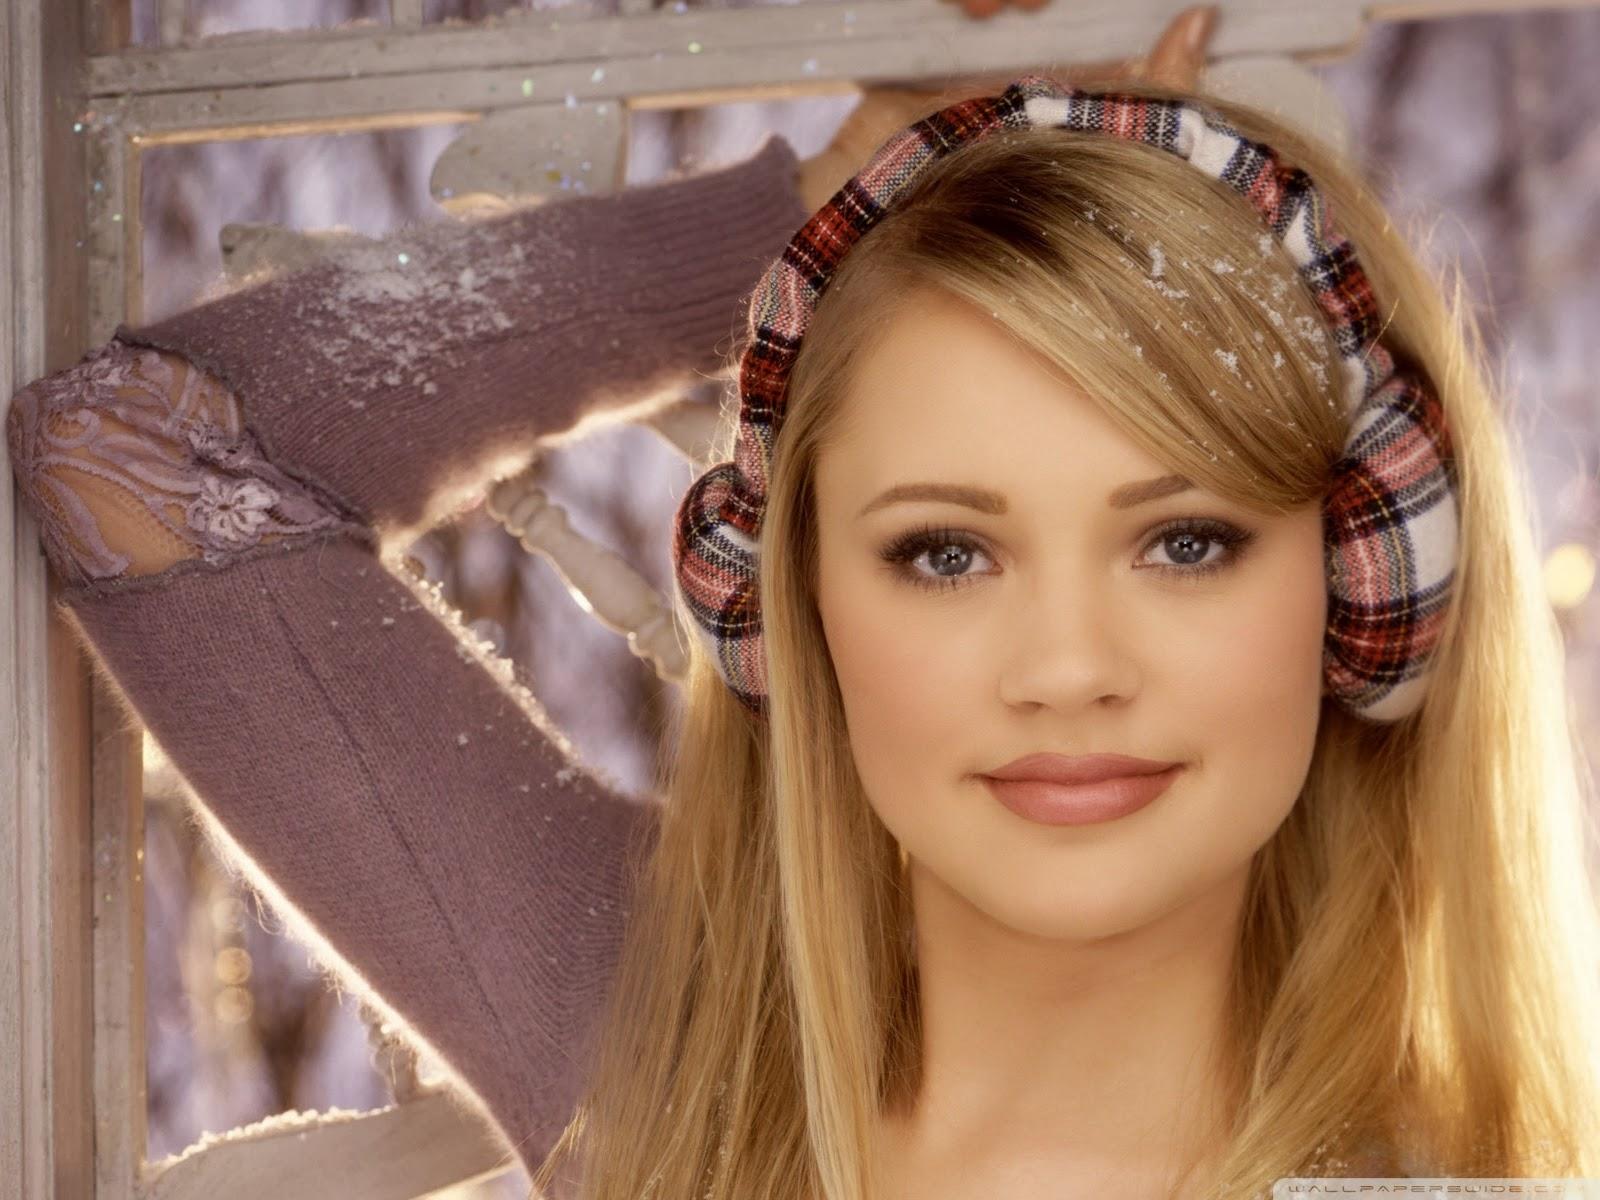 Beautiful Girls Of The World Hd Wallpapers